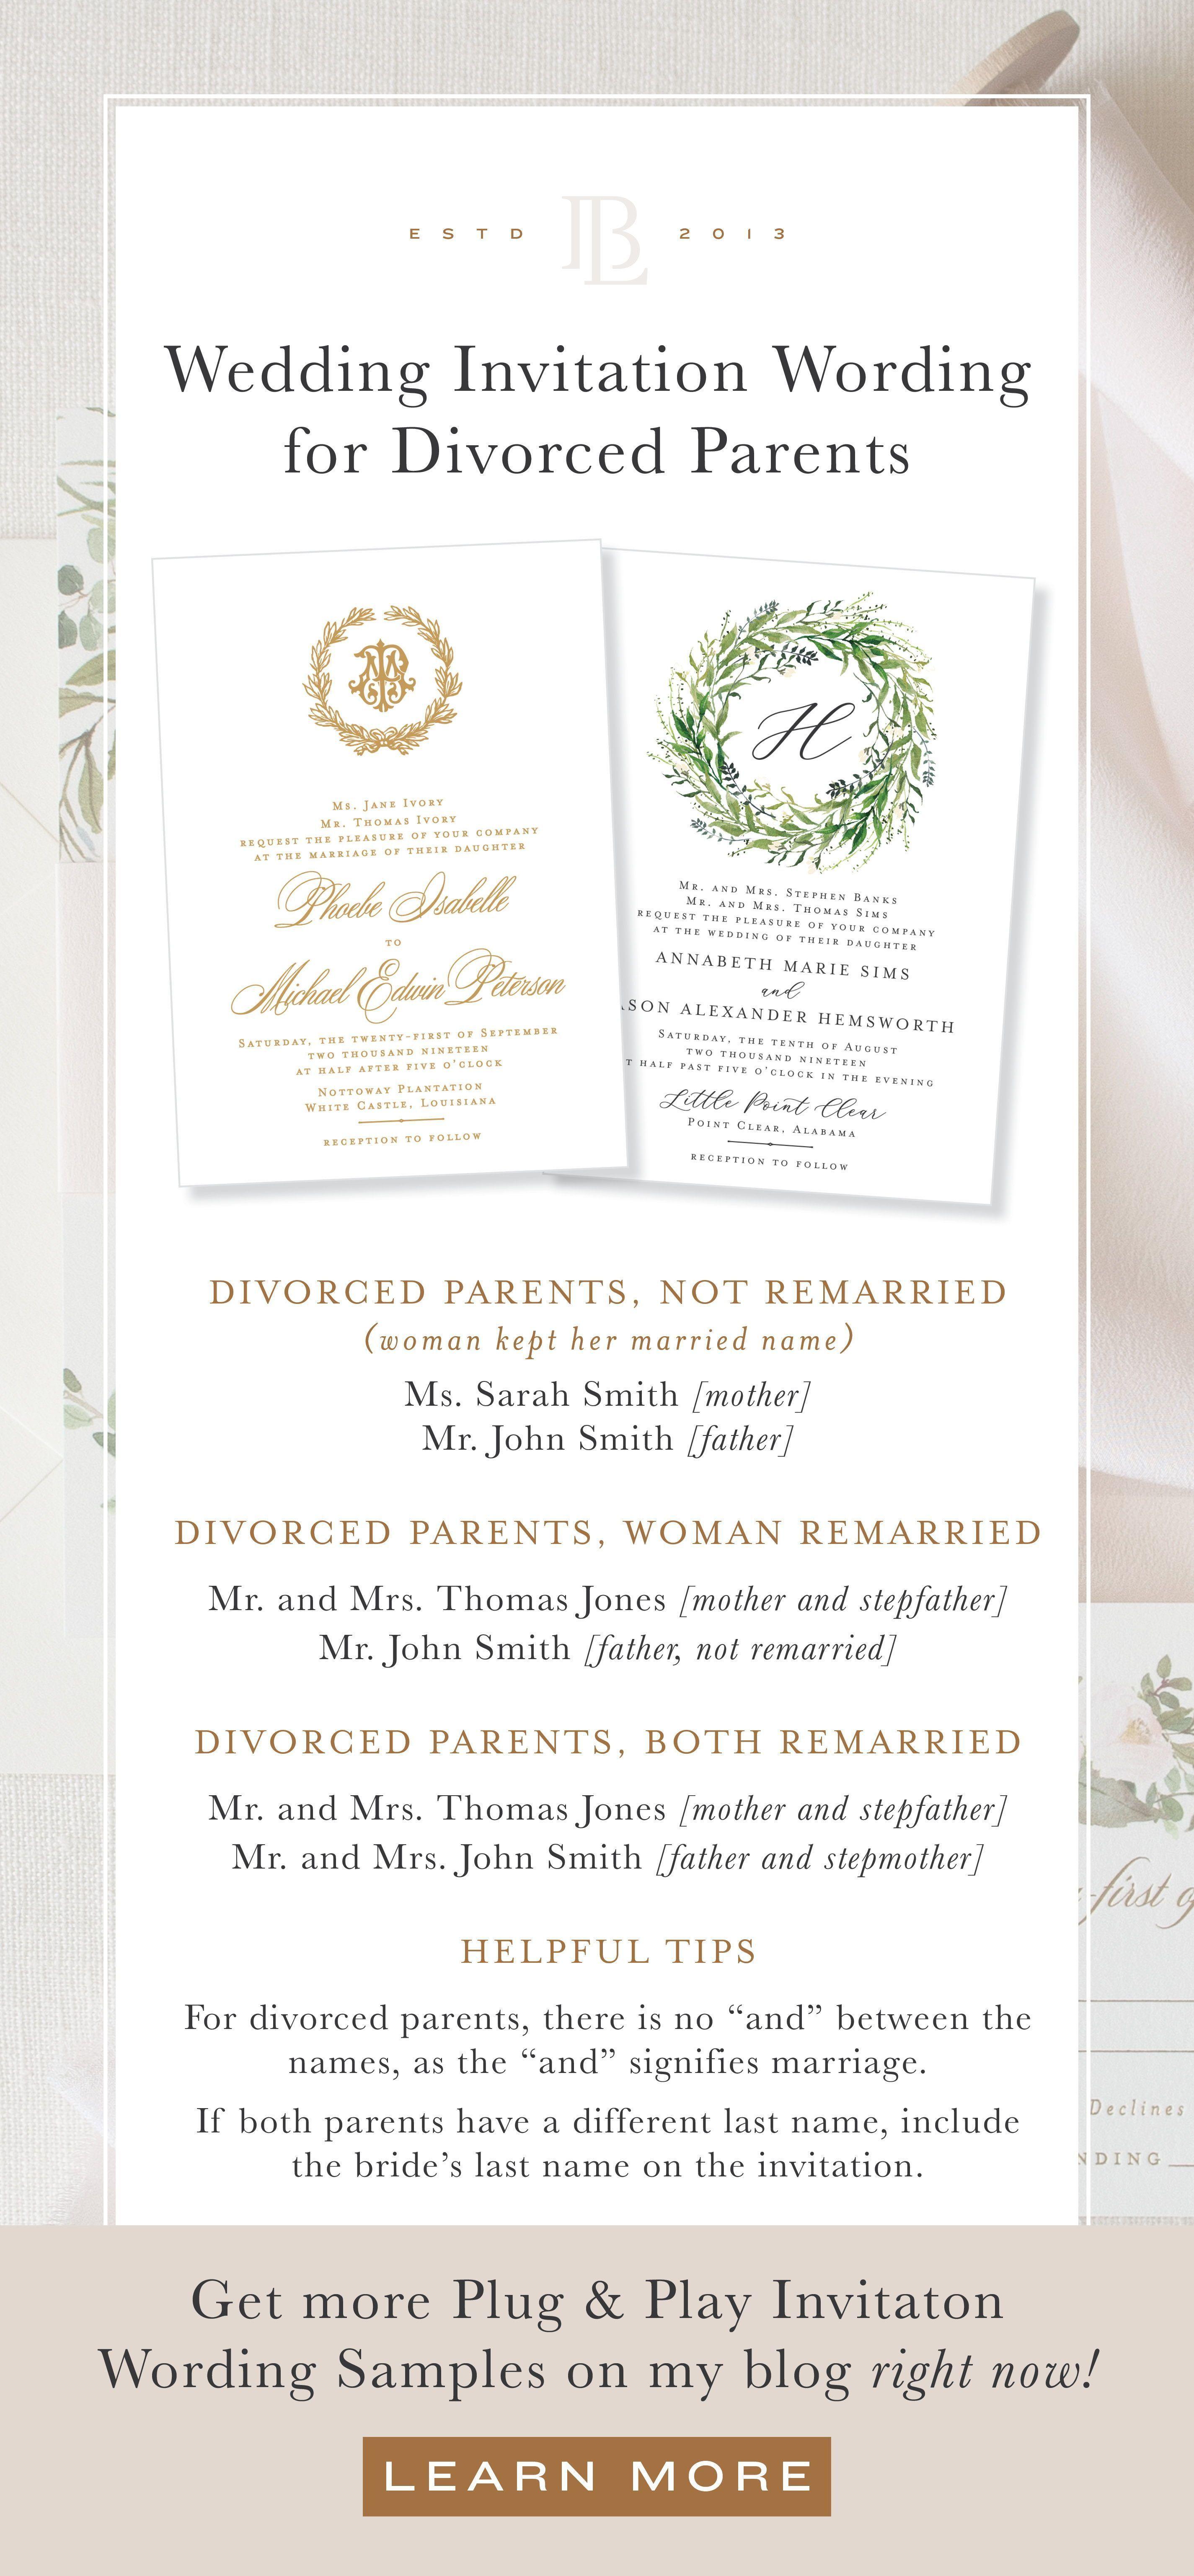 Wonderful Pics Invitation Wording Divorced Parents Popular Since You Ve In 2020 Wedding Invitation Wording Formal Formal Invitation Wording Trendy Wedding Invitations